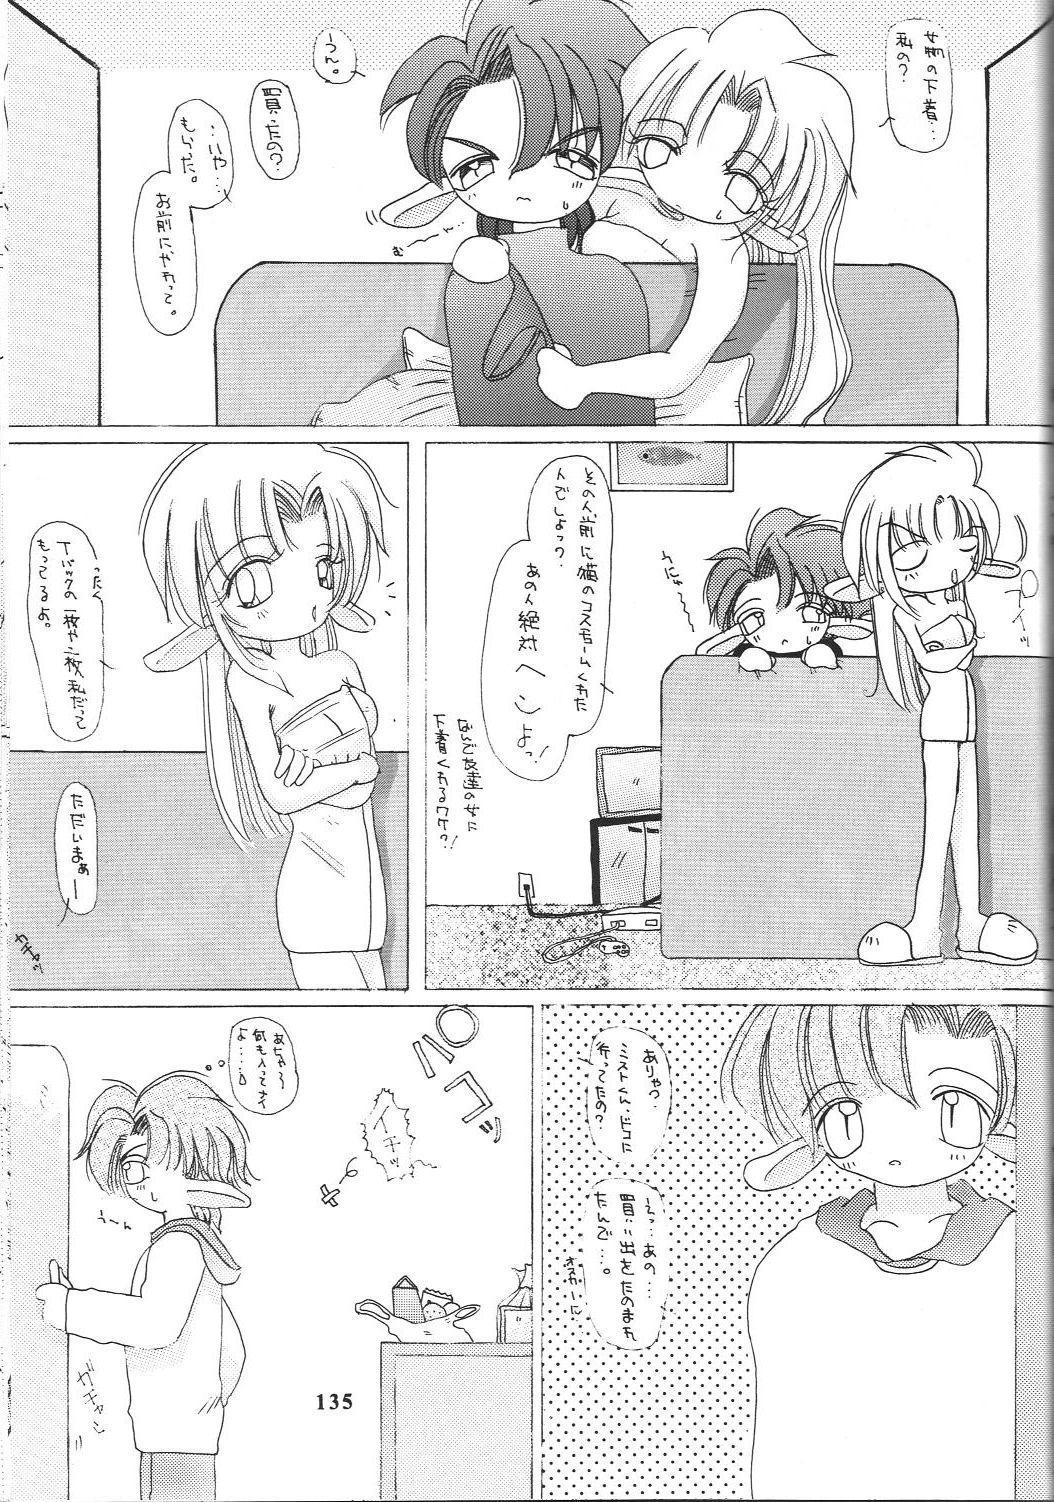 (C56) [Tsurikichi Doumei (Various)] Sengoku Rock - Nan Demo-R (Various) 136